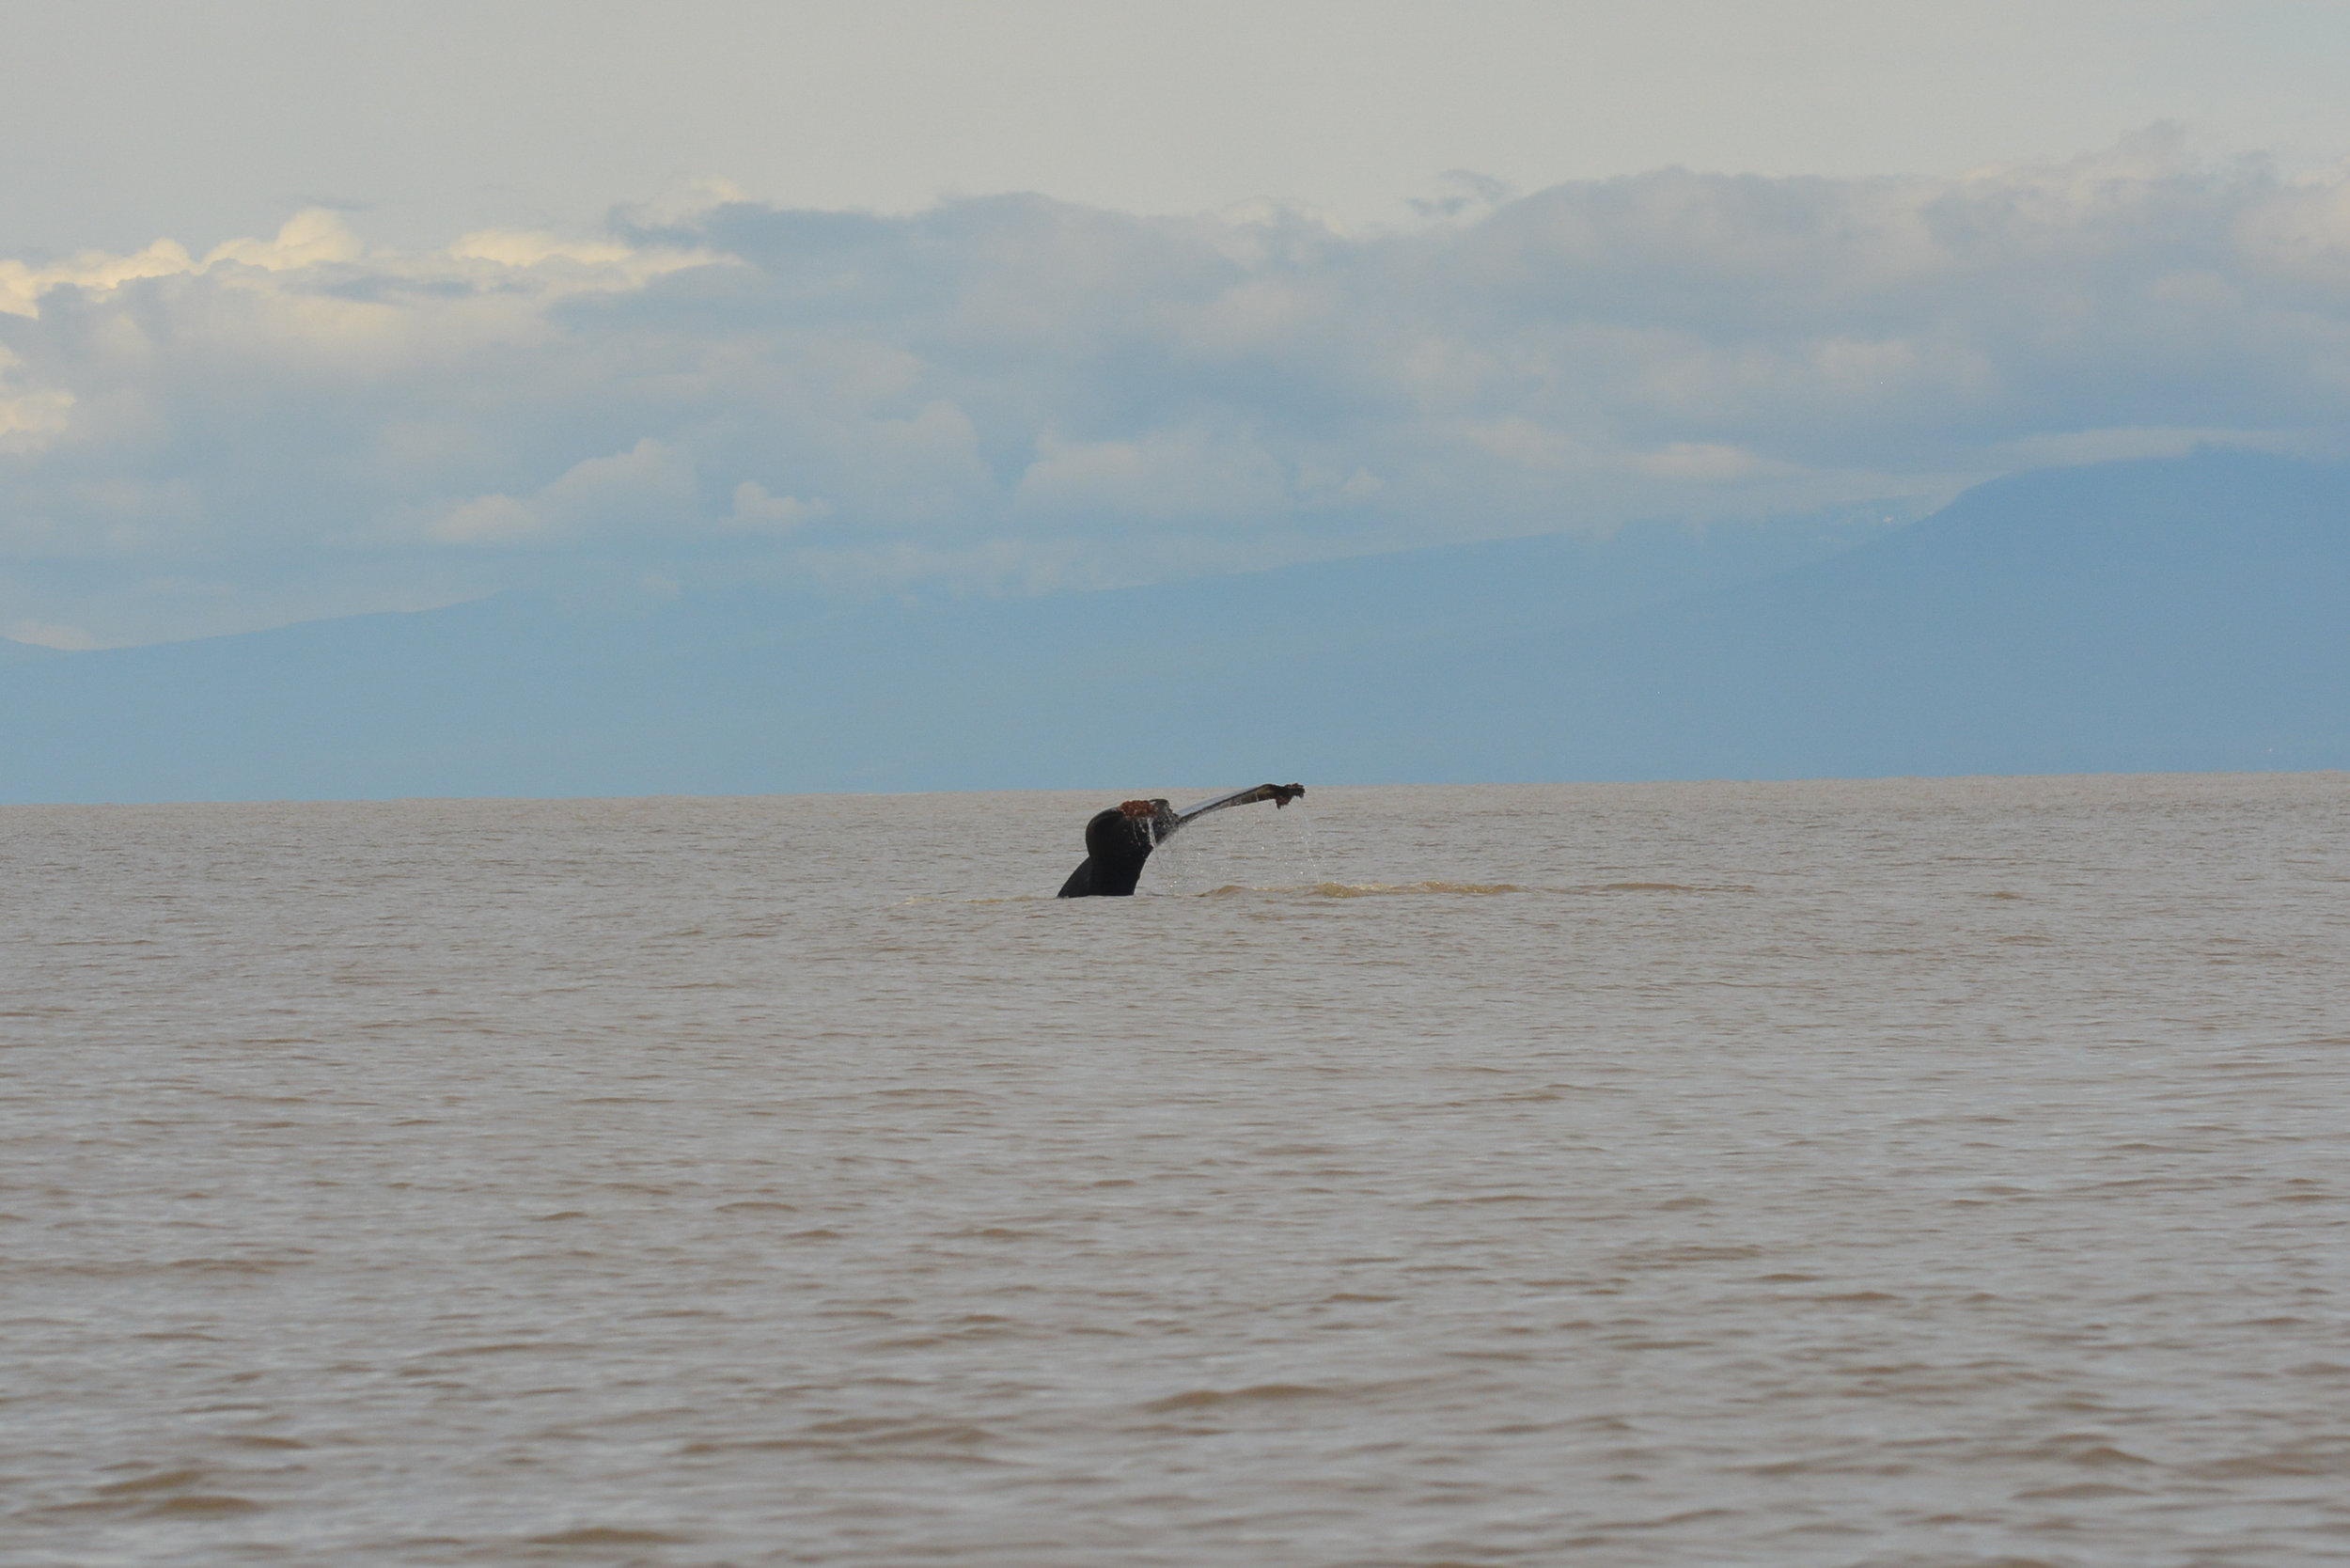 Humpback whale raising its fluke before a deep dive. Photo by Alanna Vivani